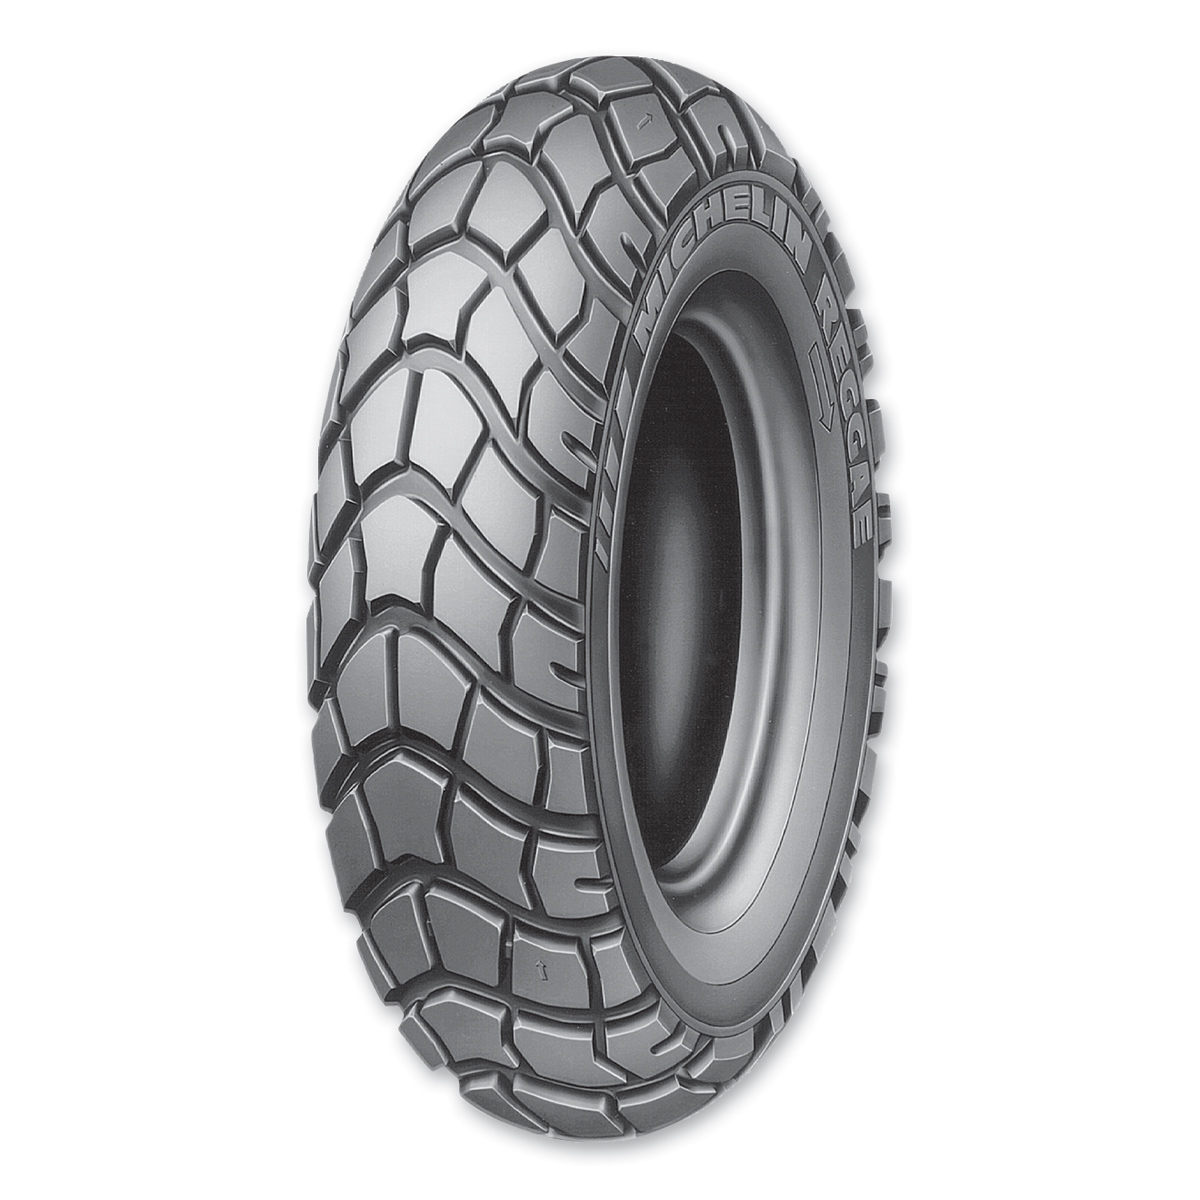 Michelin Reggae 120/90-10 Front/Rear Tire